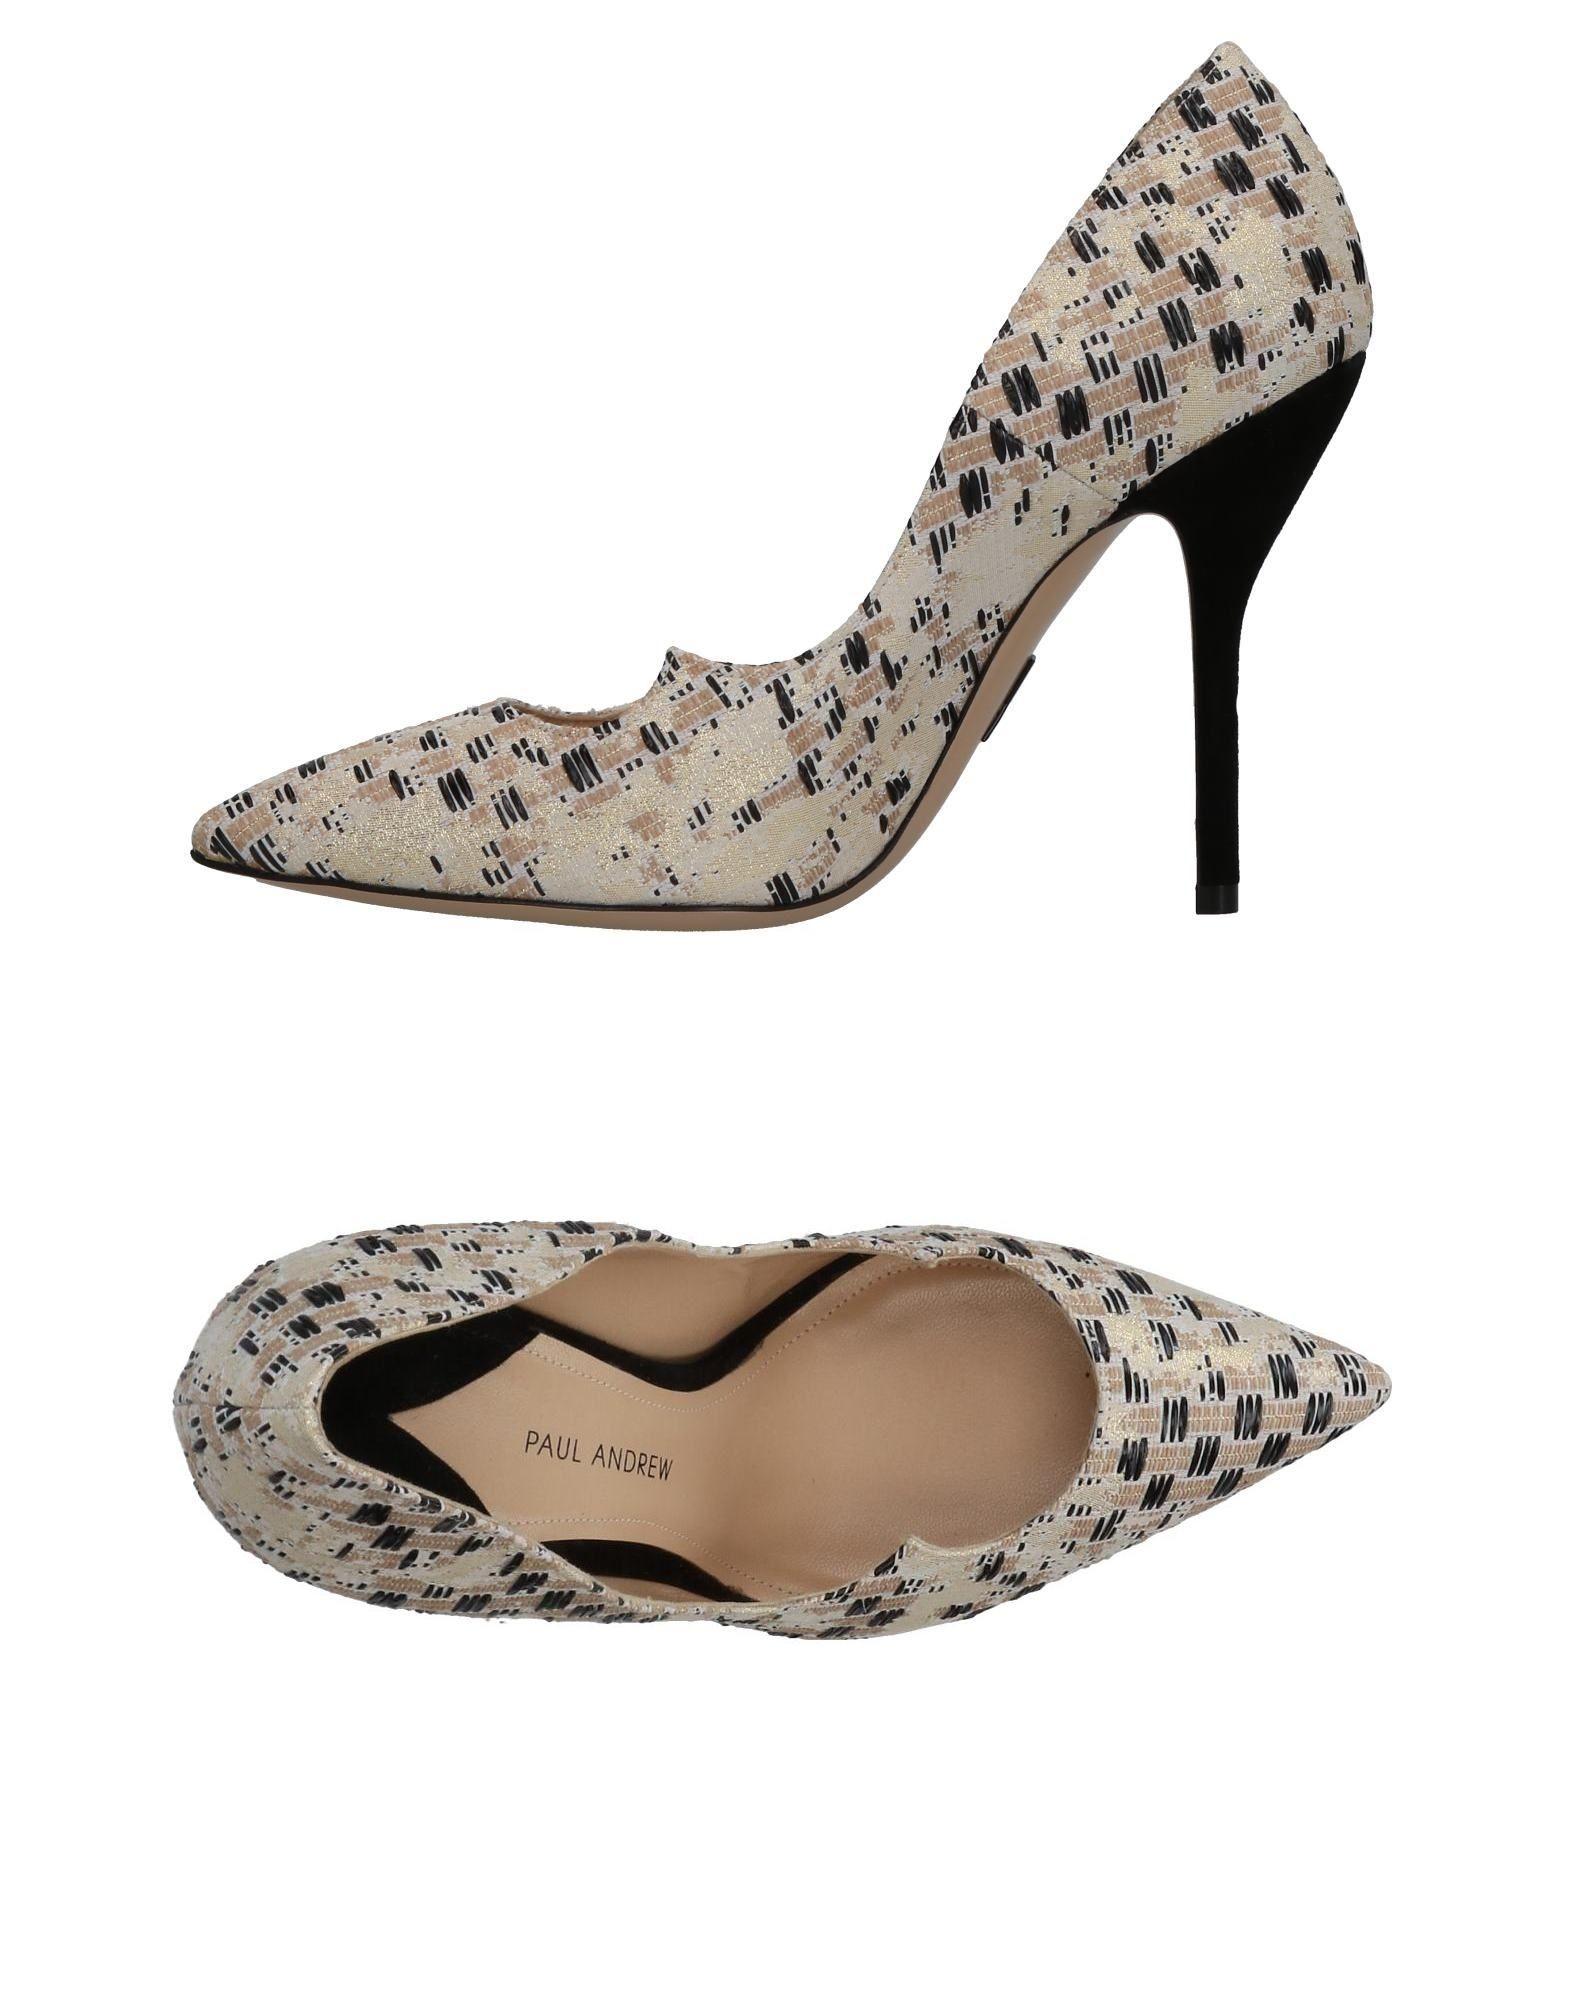 Stilvolle billige Schuhe Schuhe Schuhe Paul Andrew Pumps Damen  11343750OI 87c8c4